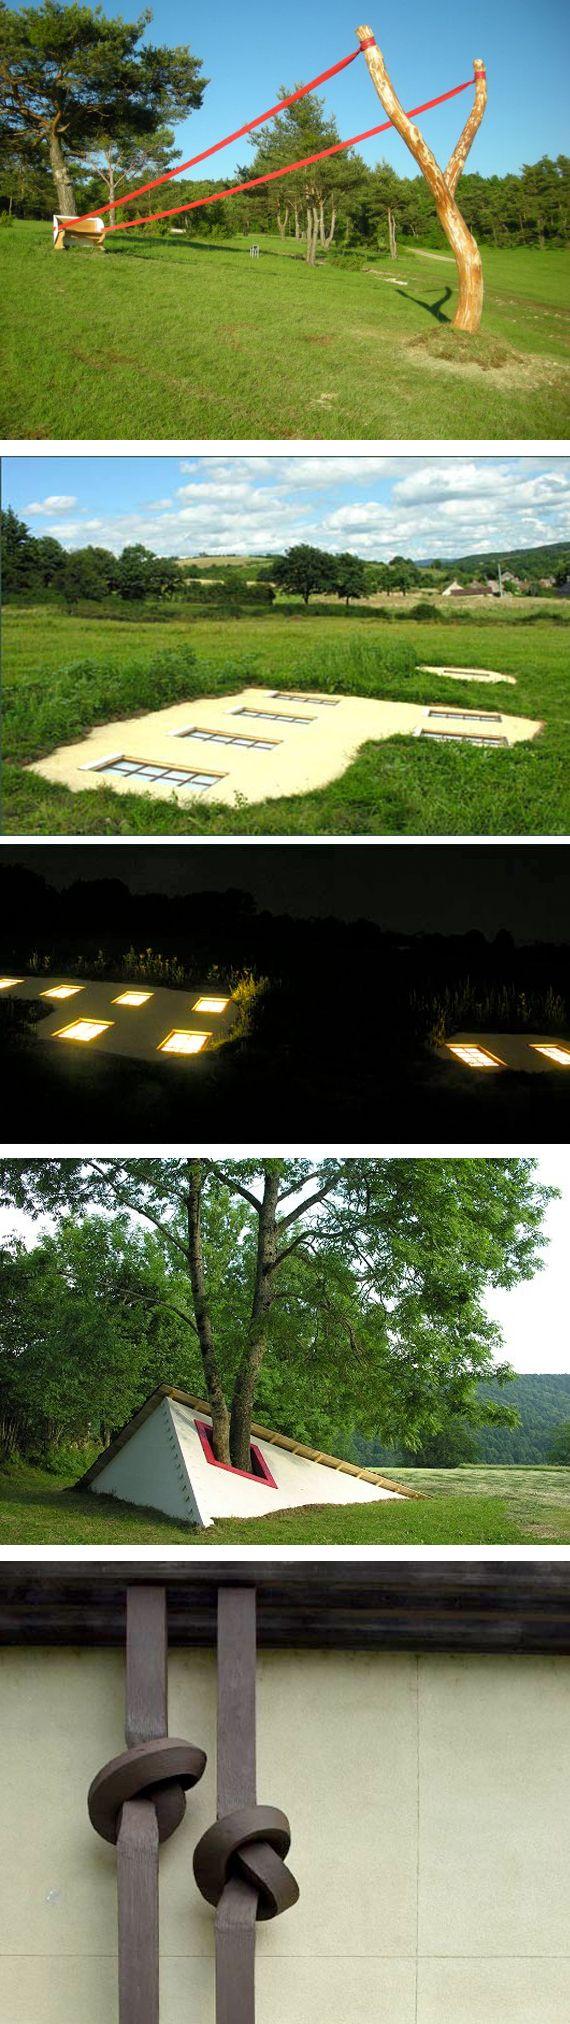 Cornelia Konrads Sculptures outdoor installation art (reminds me of Claes Oldenburg)